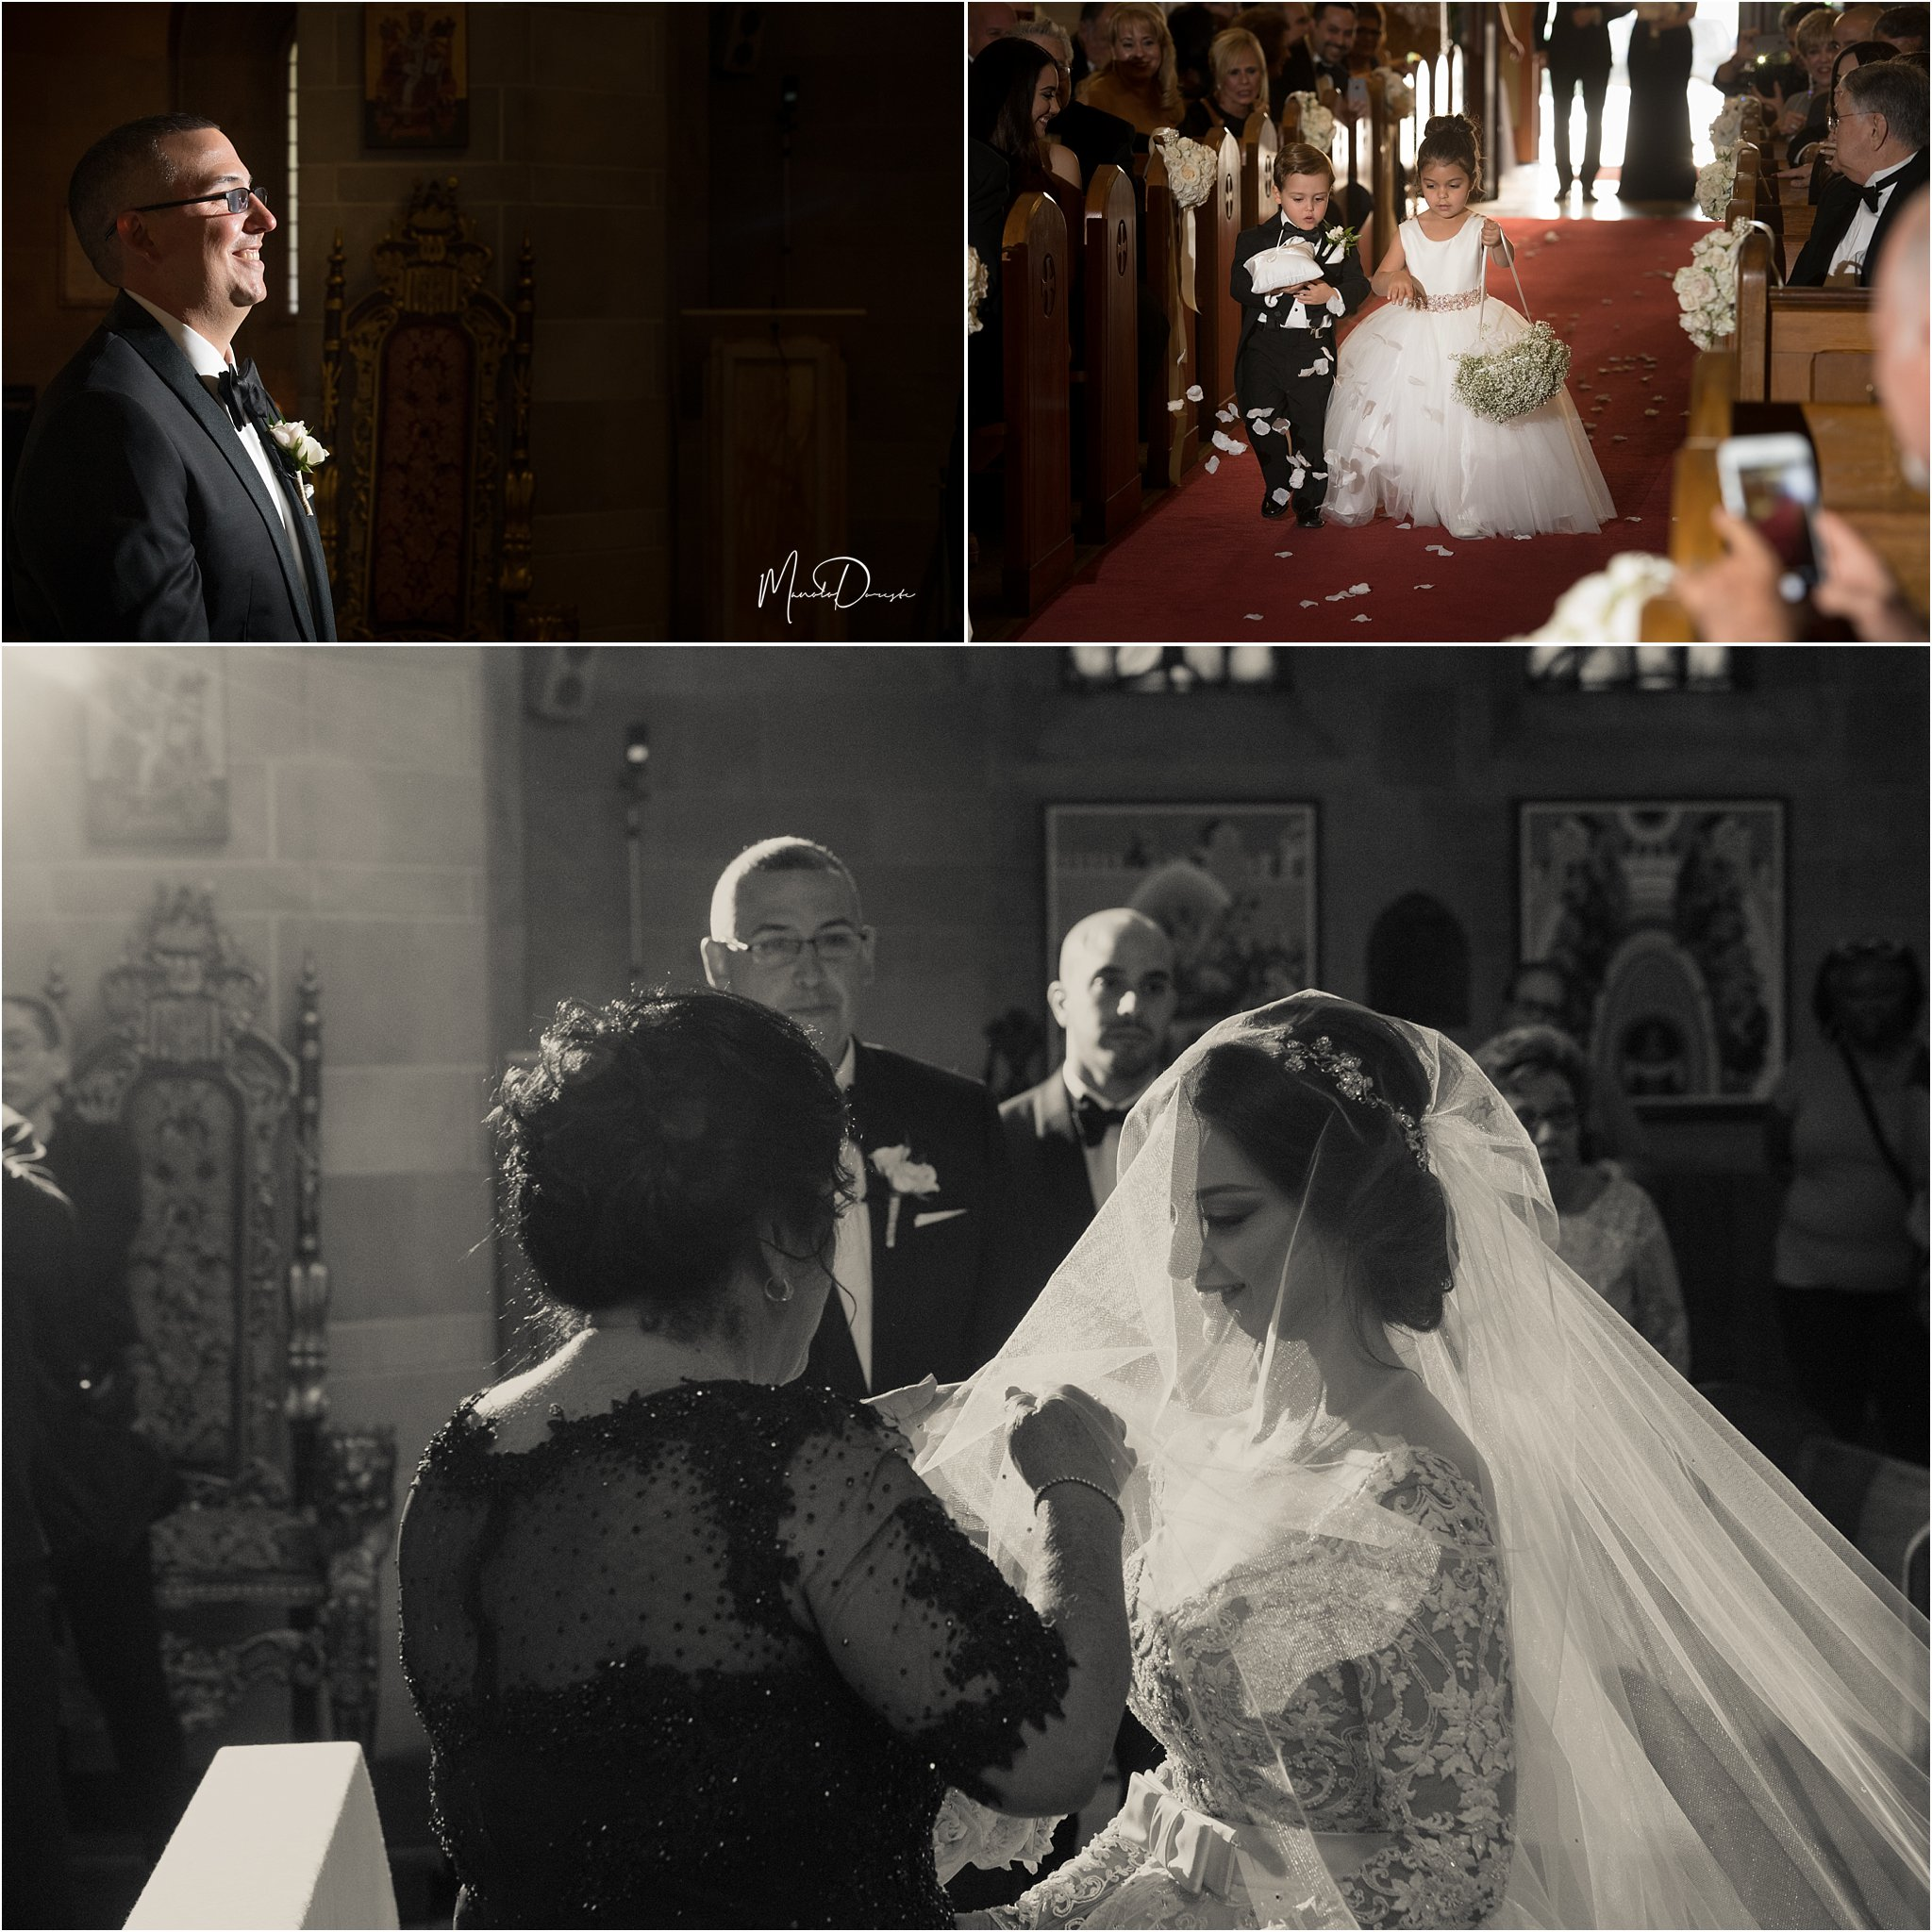 00718_ManoloDoreste_InFocusStudios_Wedding_Family_Photography_Miami_MiamiPhotographer.jpg